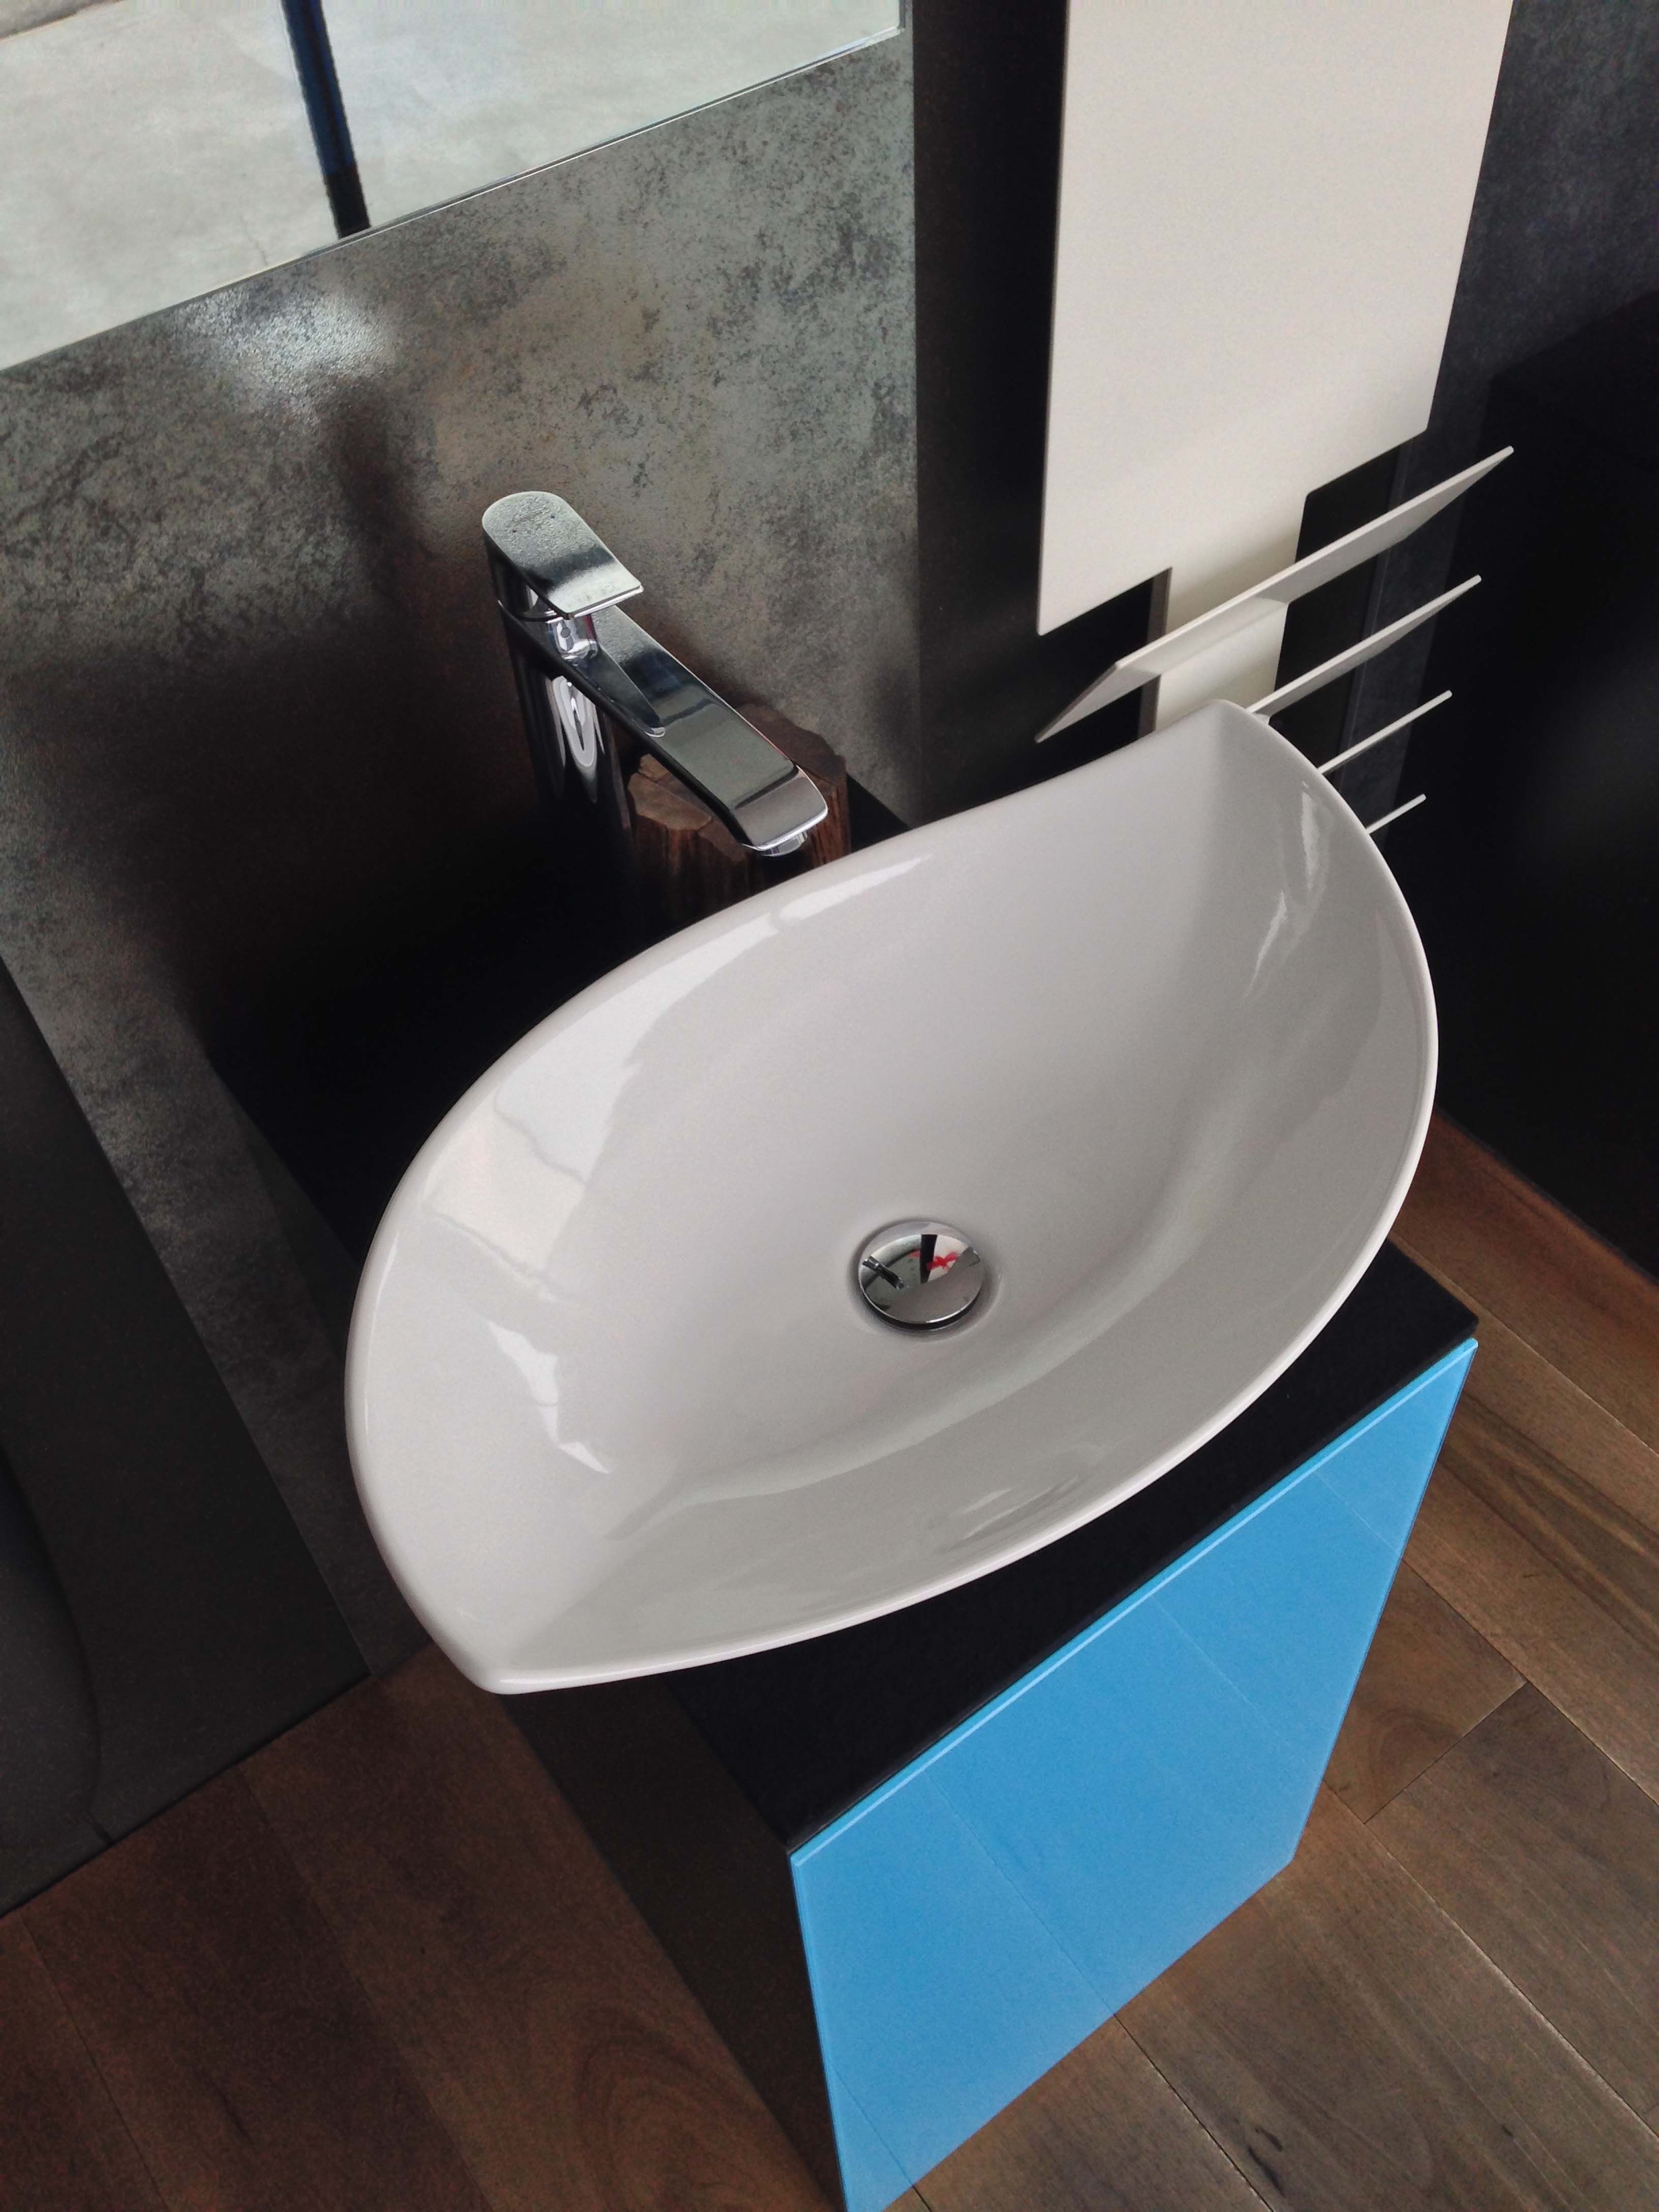 Sanikal Bad Heizung La Ftung Badeinrichtungen Sa Dtirol Eppan